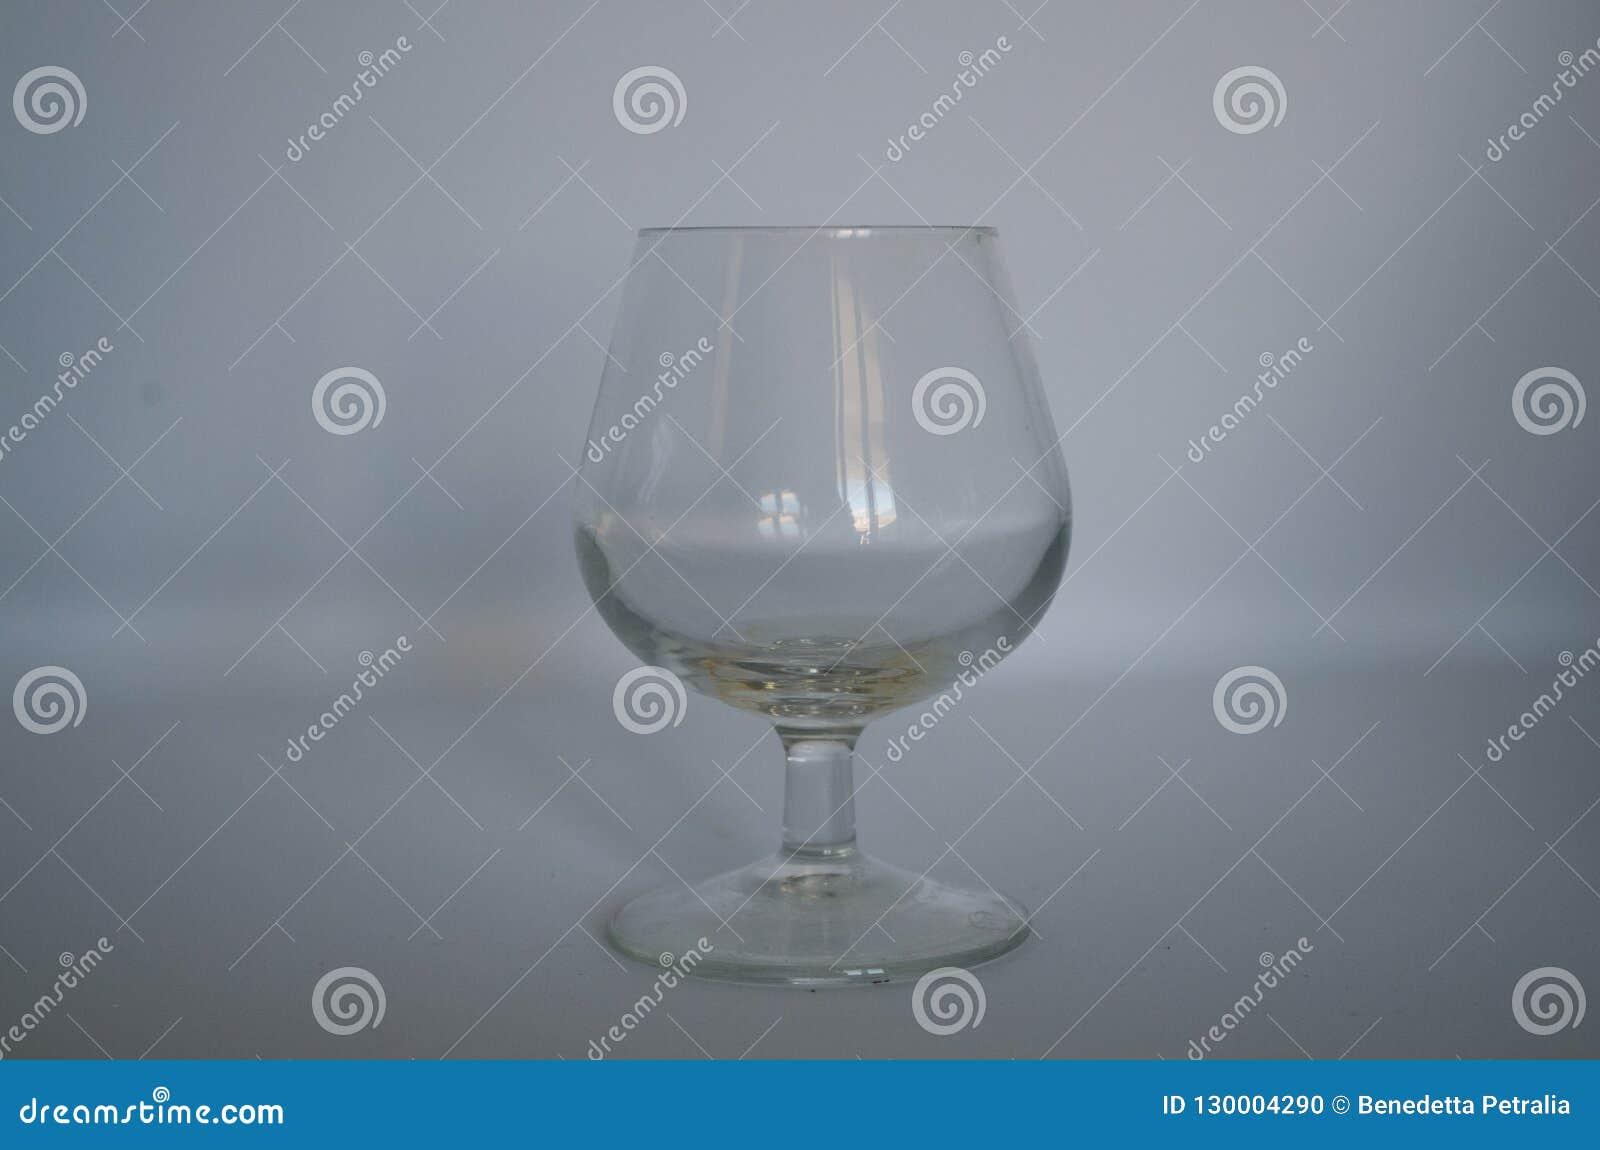 Cognac glass empty on white background